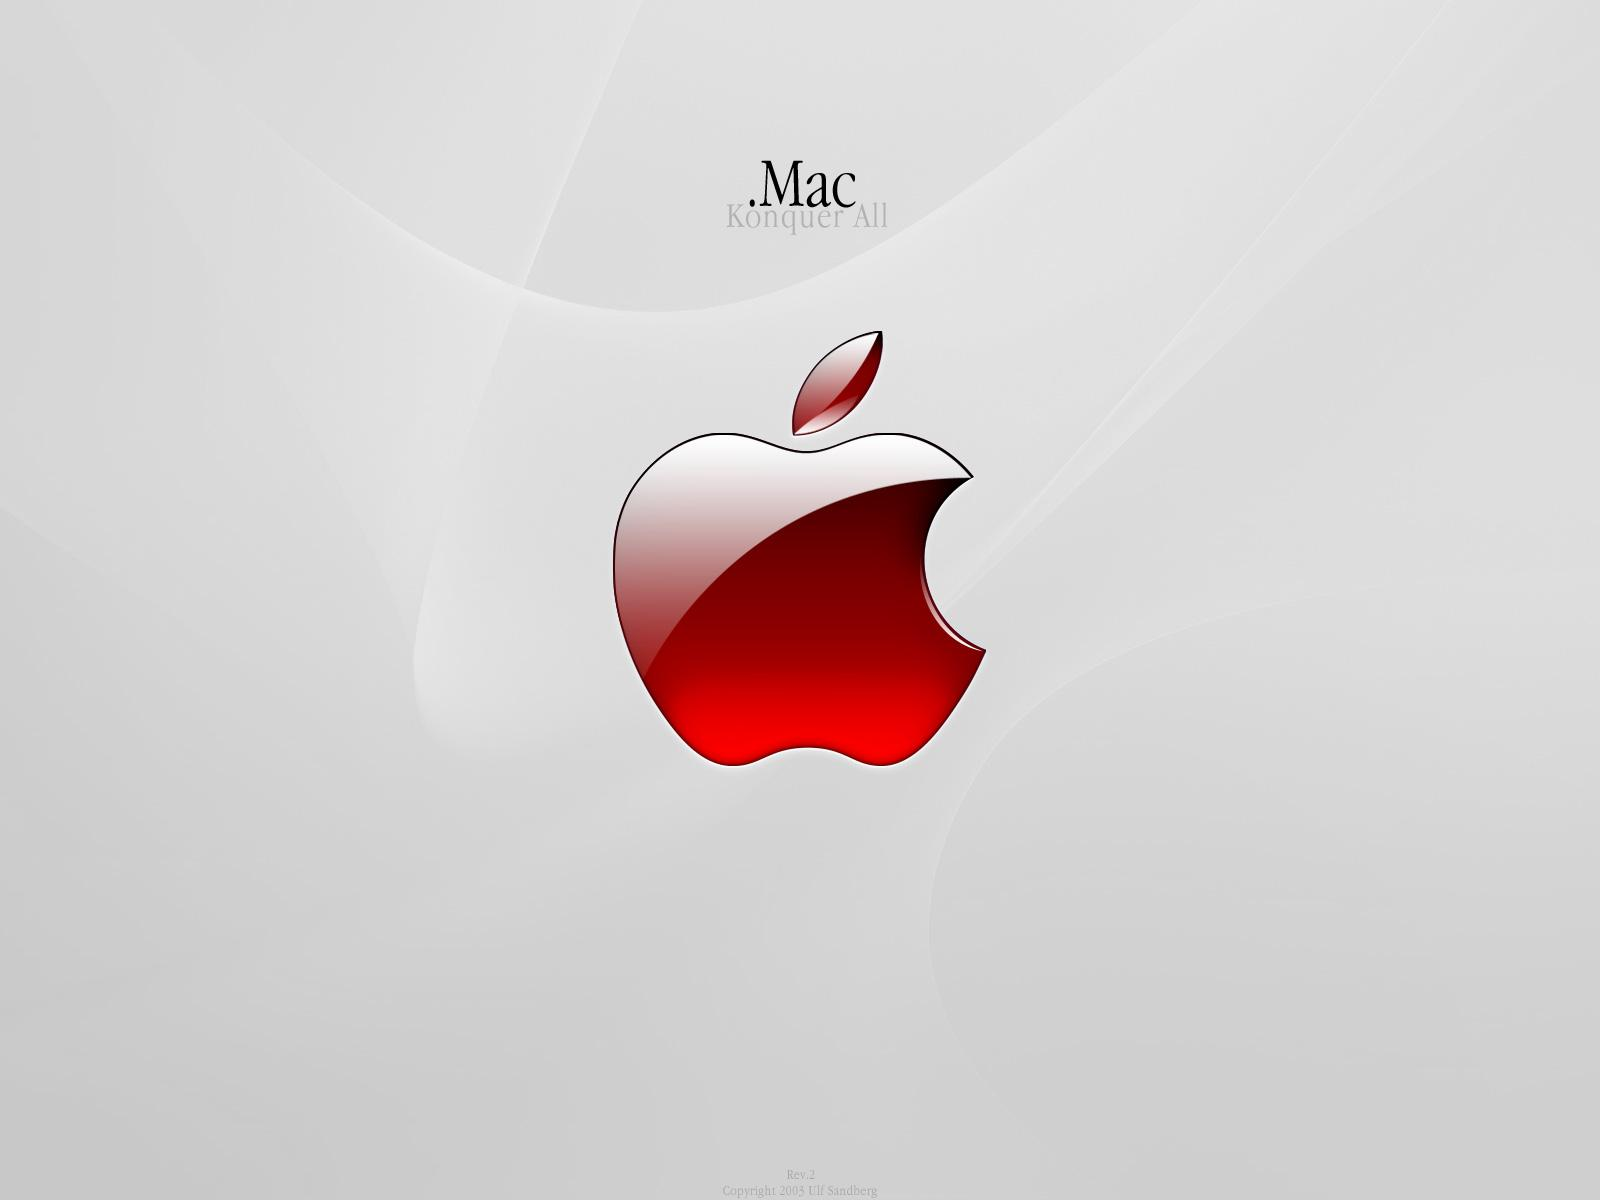 apple mac wallpapers hd | all hd wallpapers